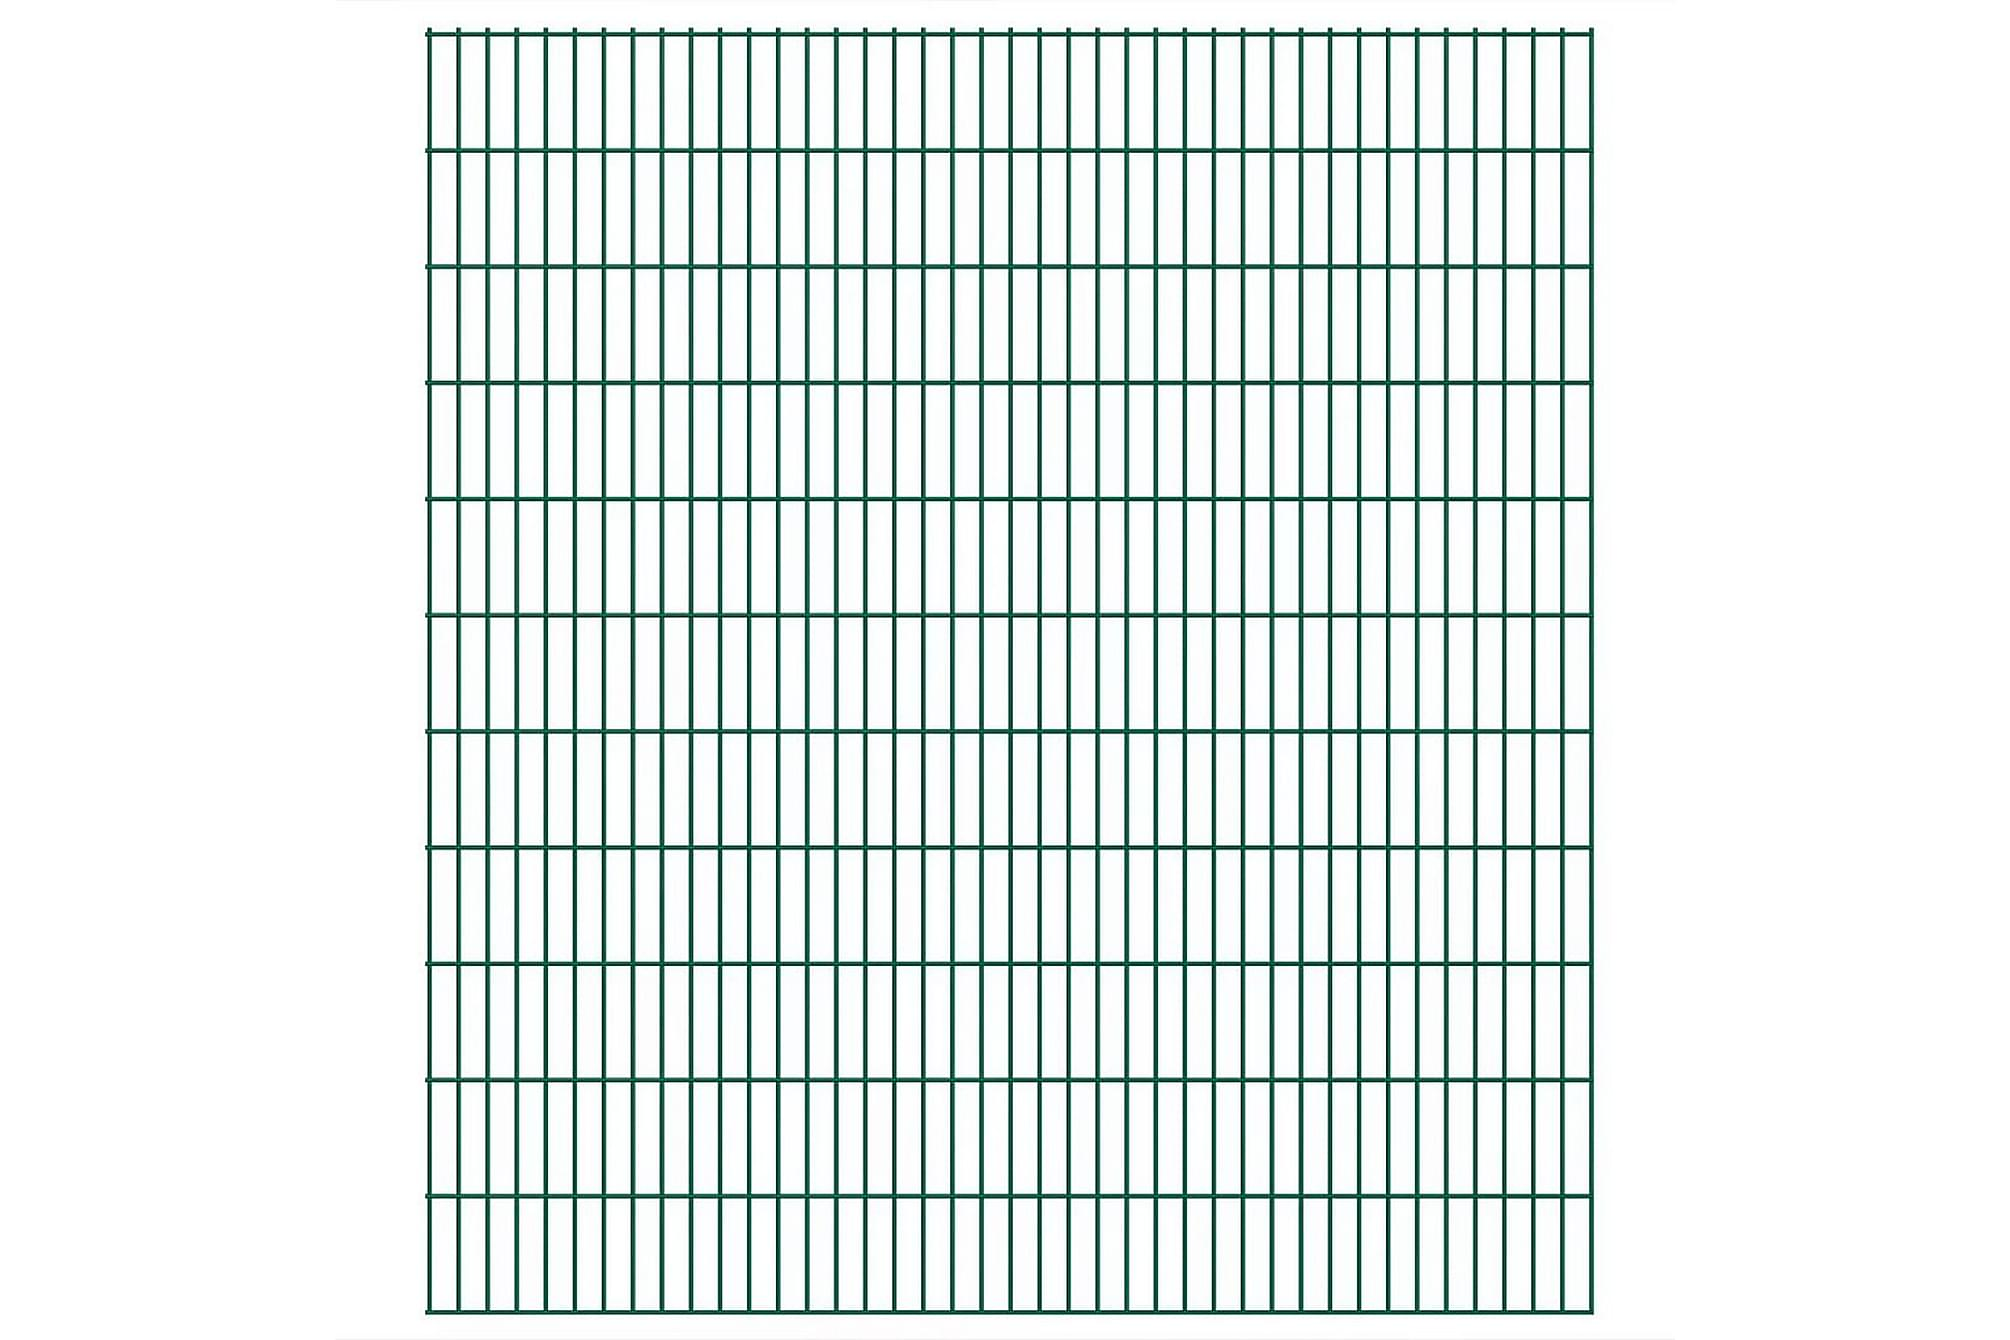 2D Stängselpaneler 2,008x2,23 m grön, Staket & grindar